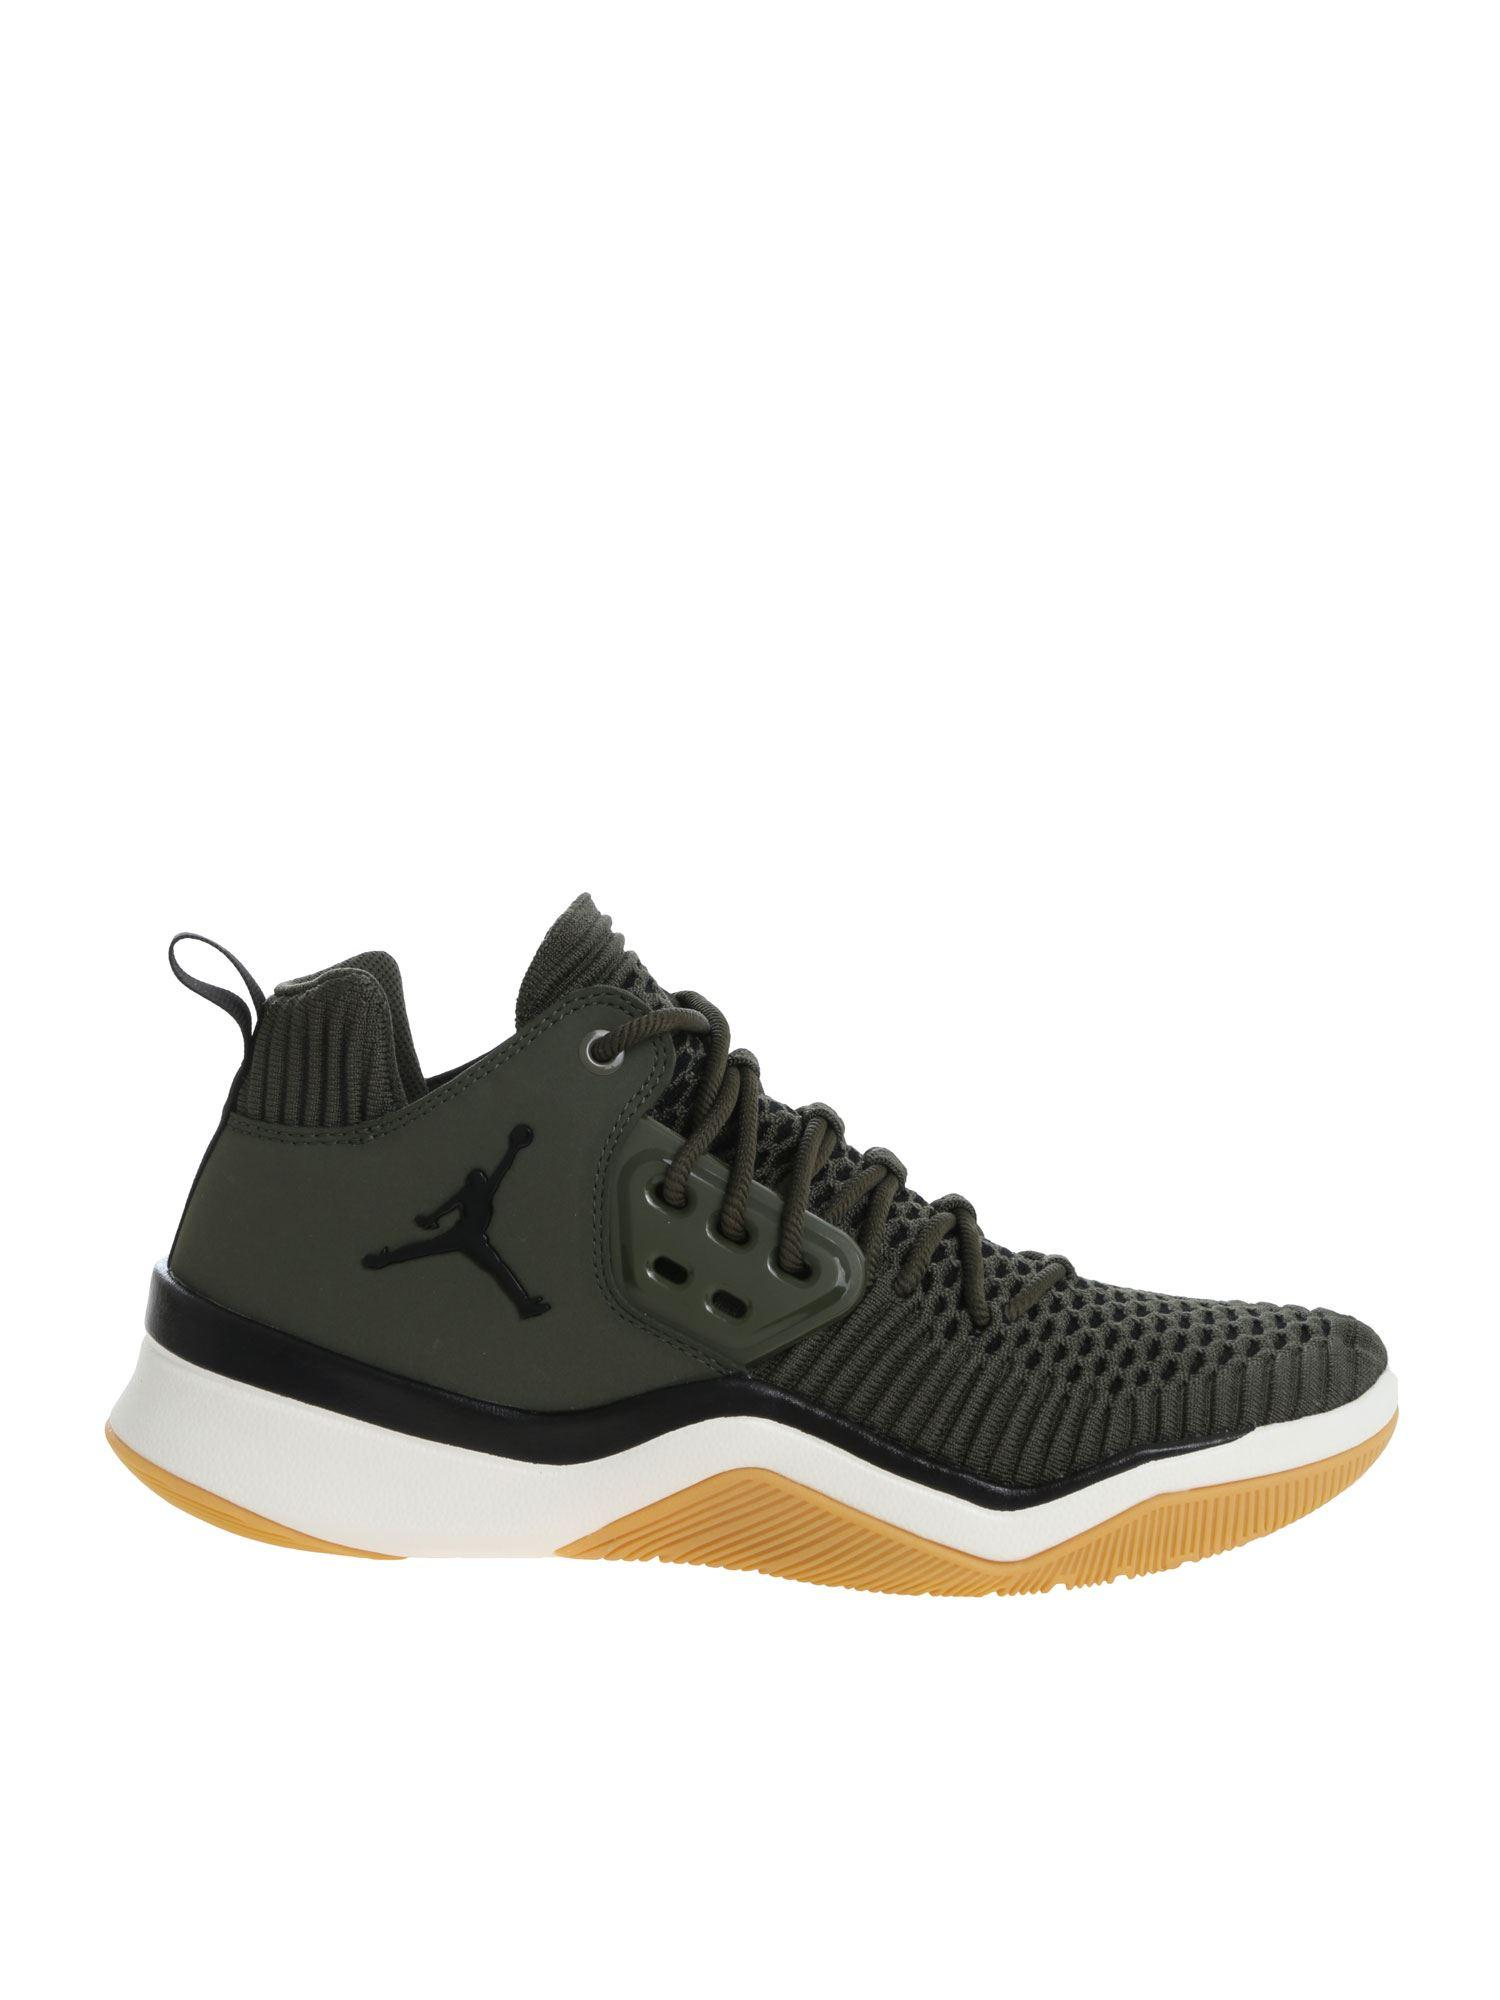 628bafe8a629f6 Nike